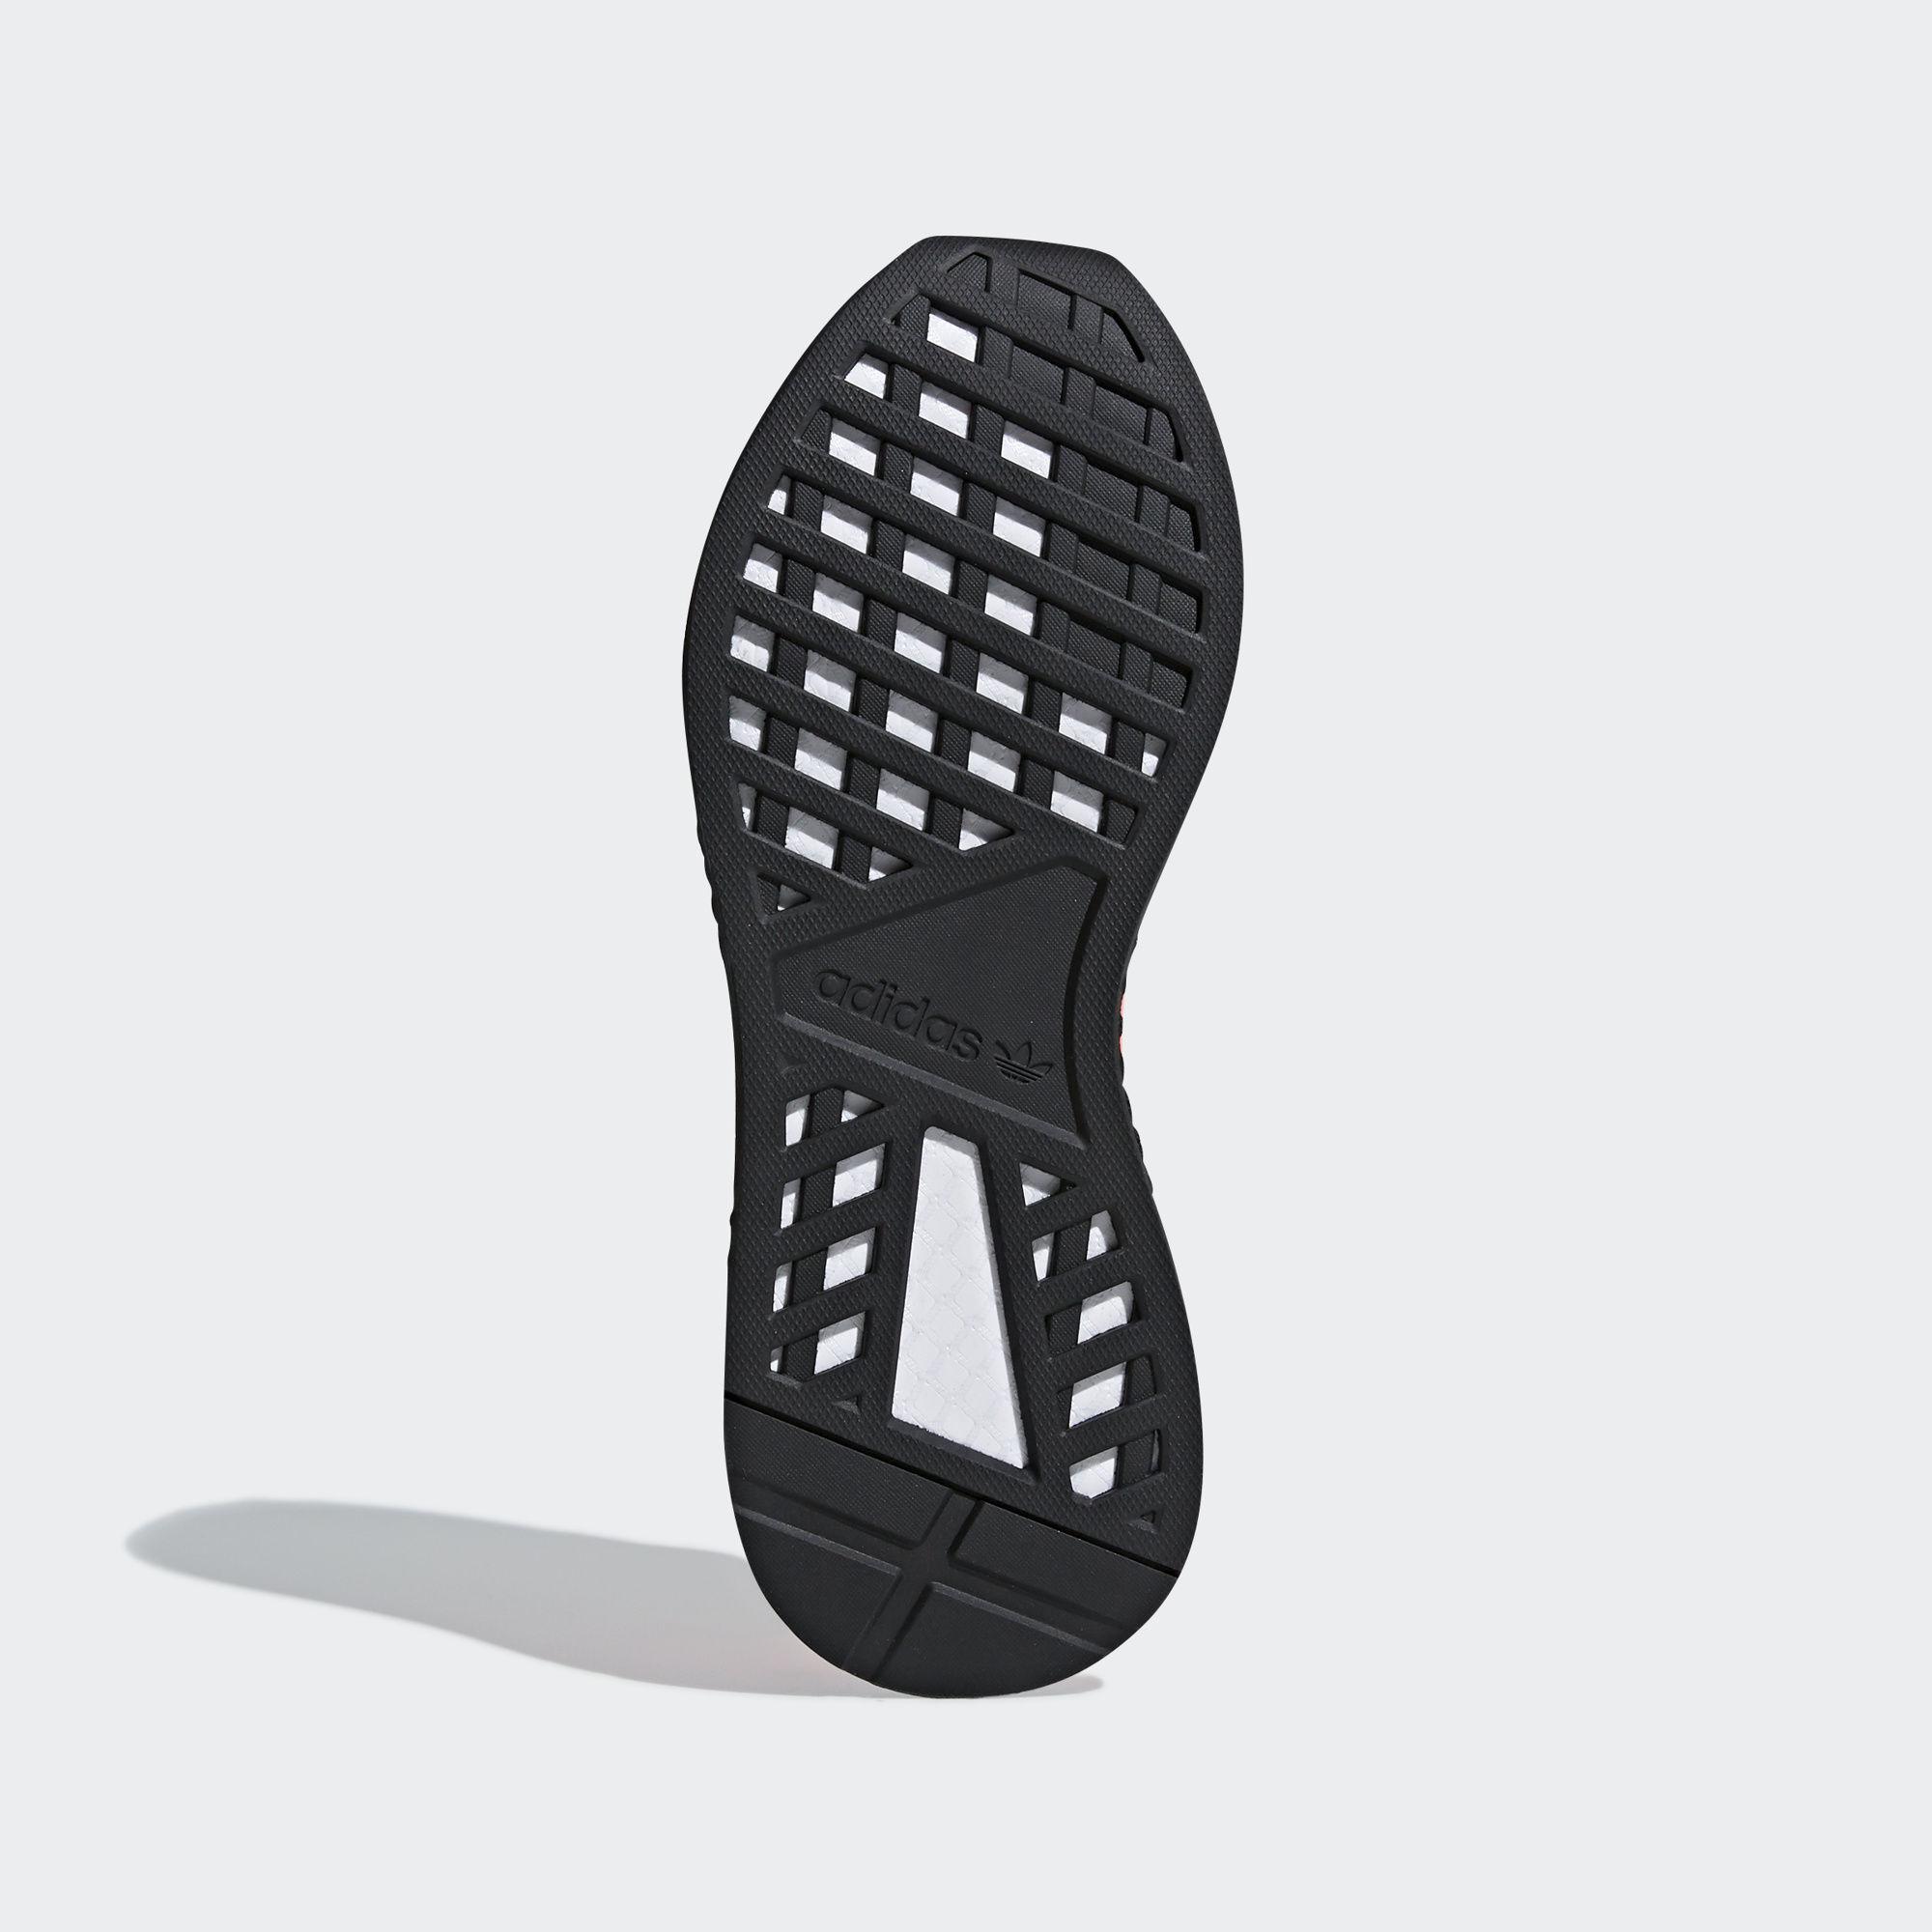 Adidas Deerupt Runner Turbo / Turbo / Core Black (B41769)